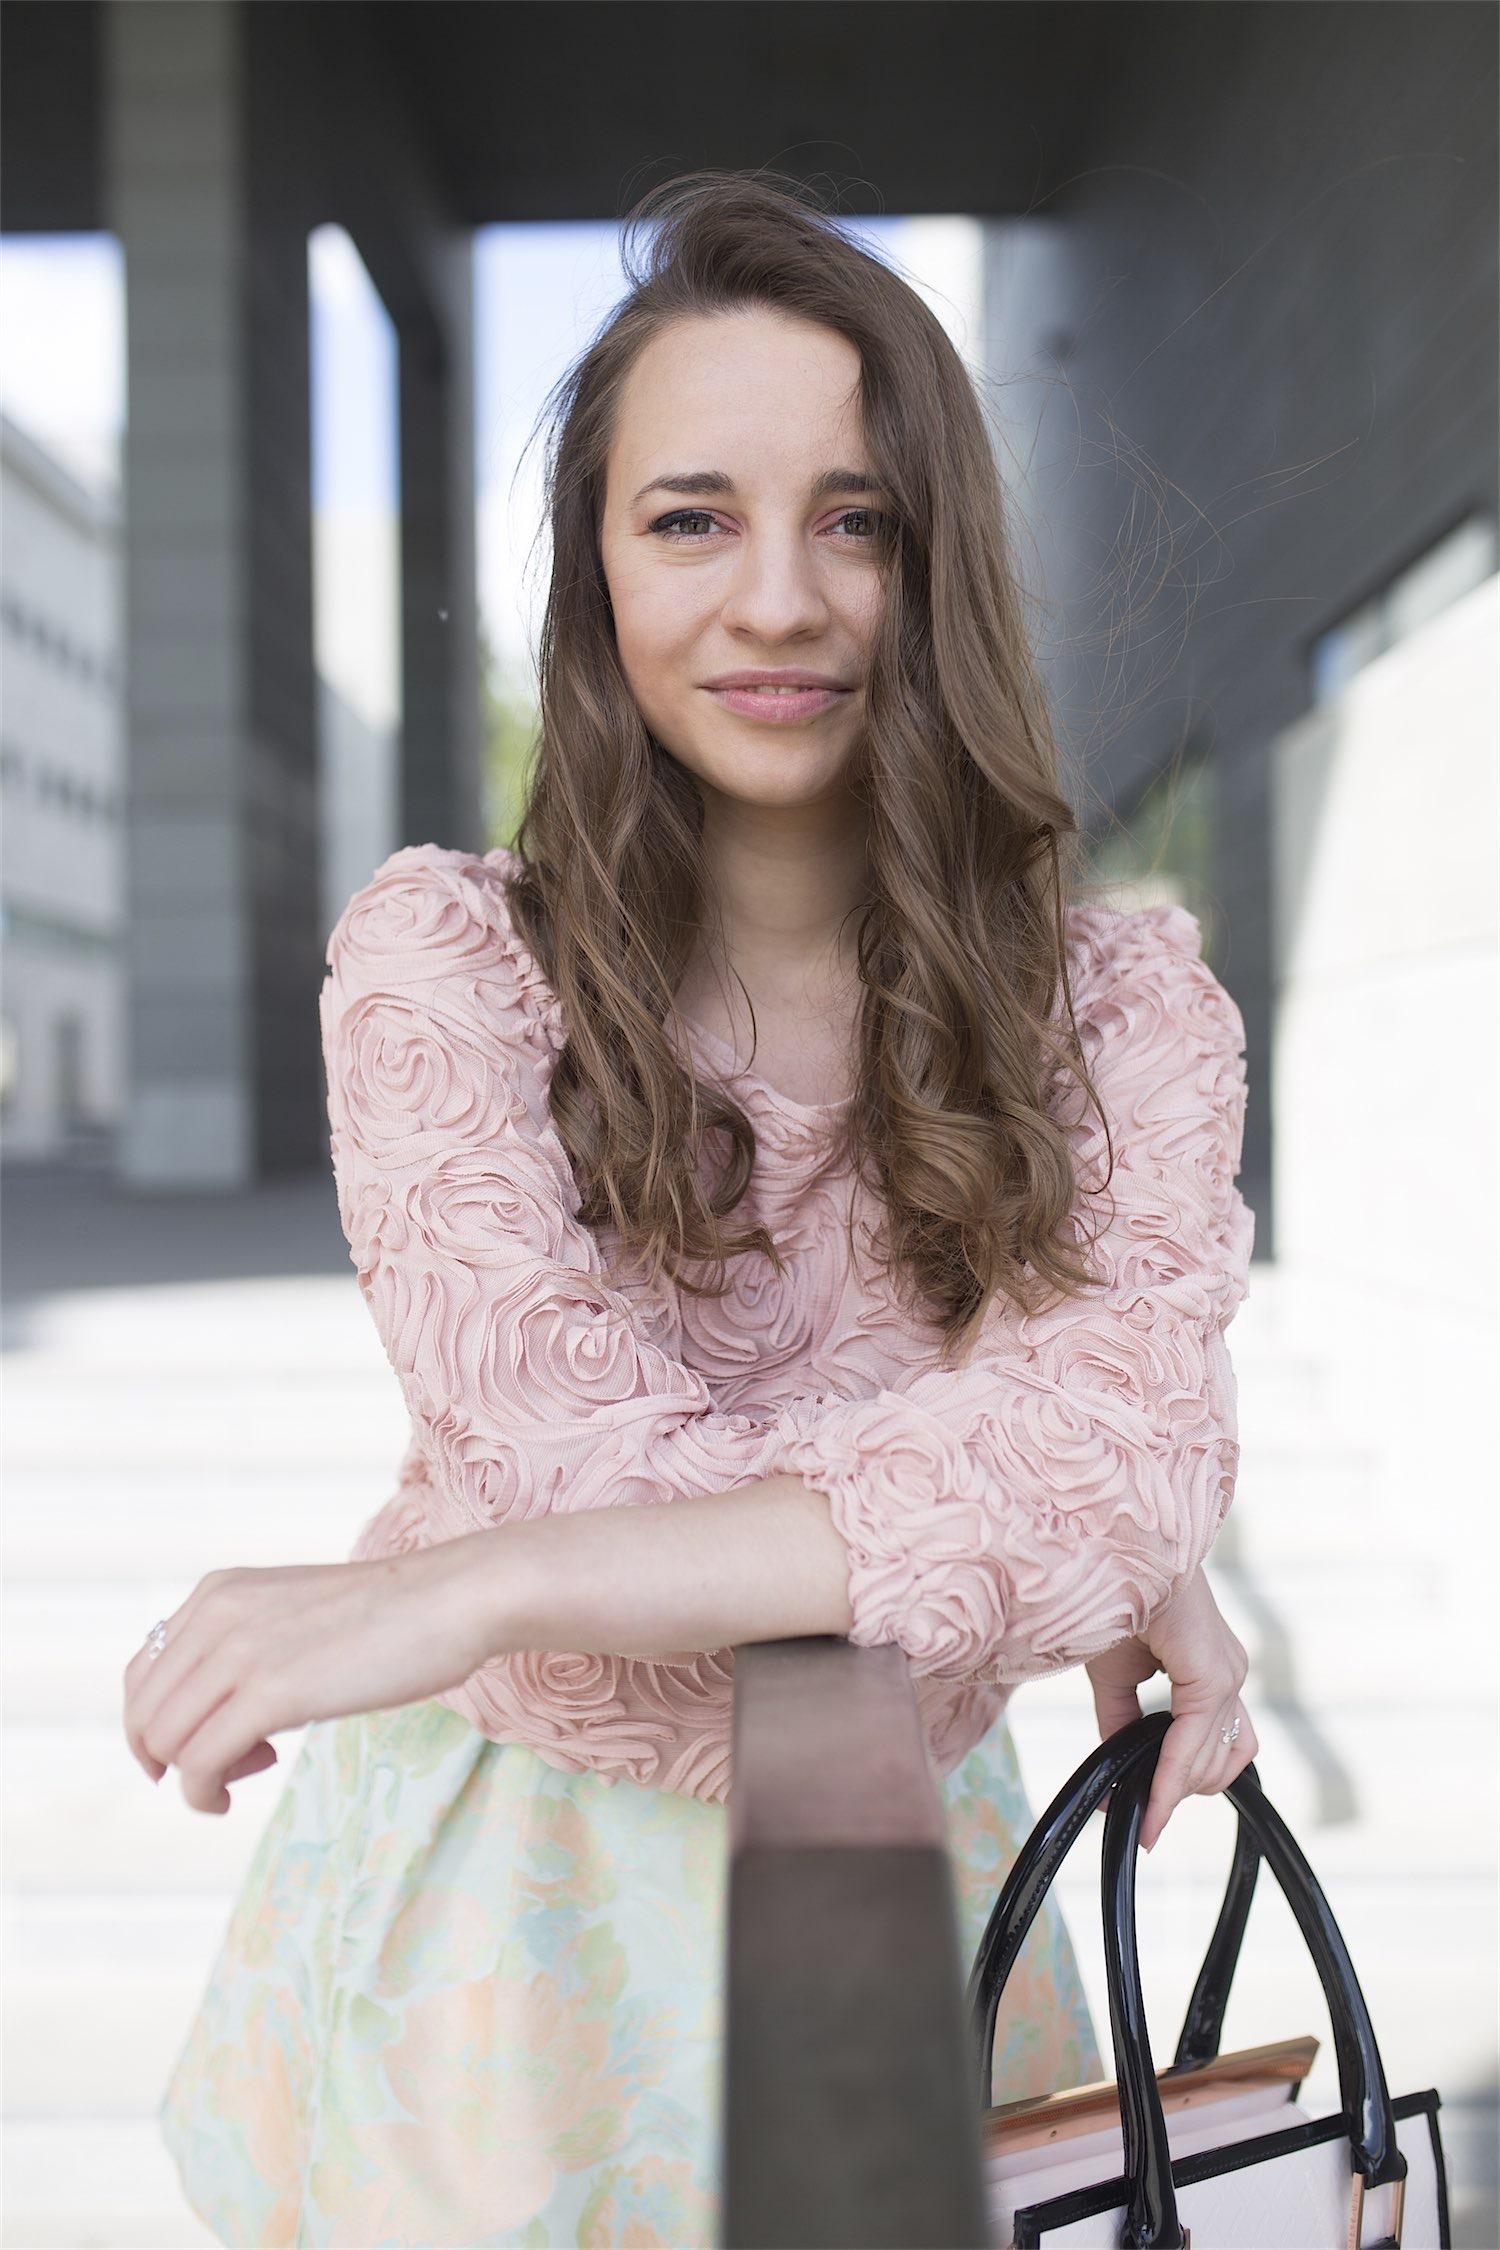 fashion-blogger-kateillustrate-tedbaker-skirt6